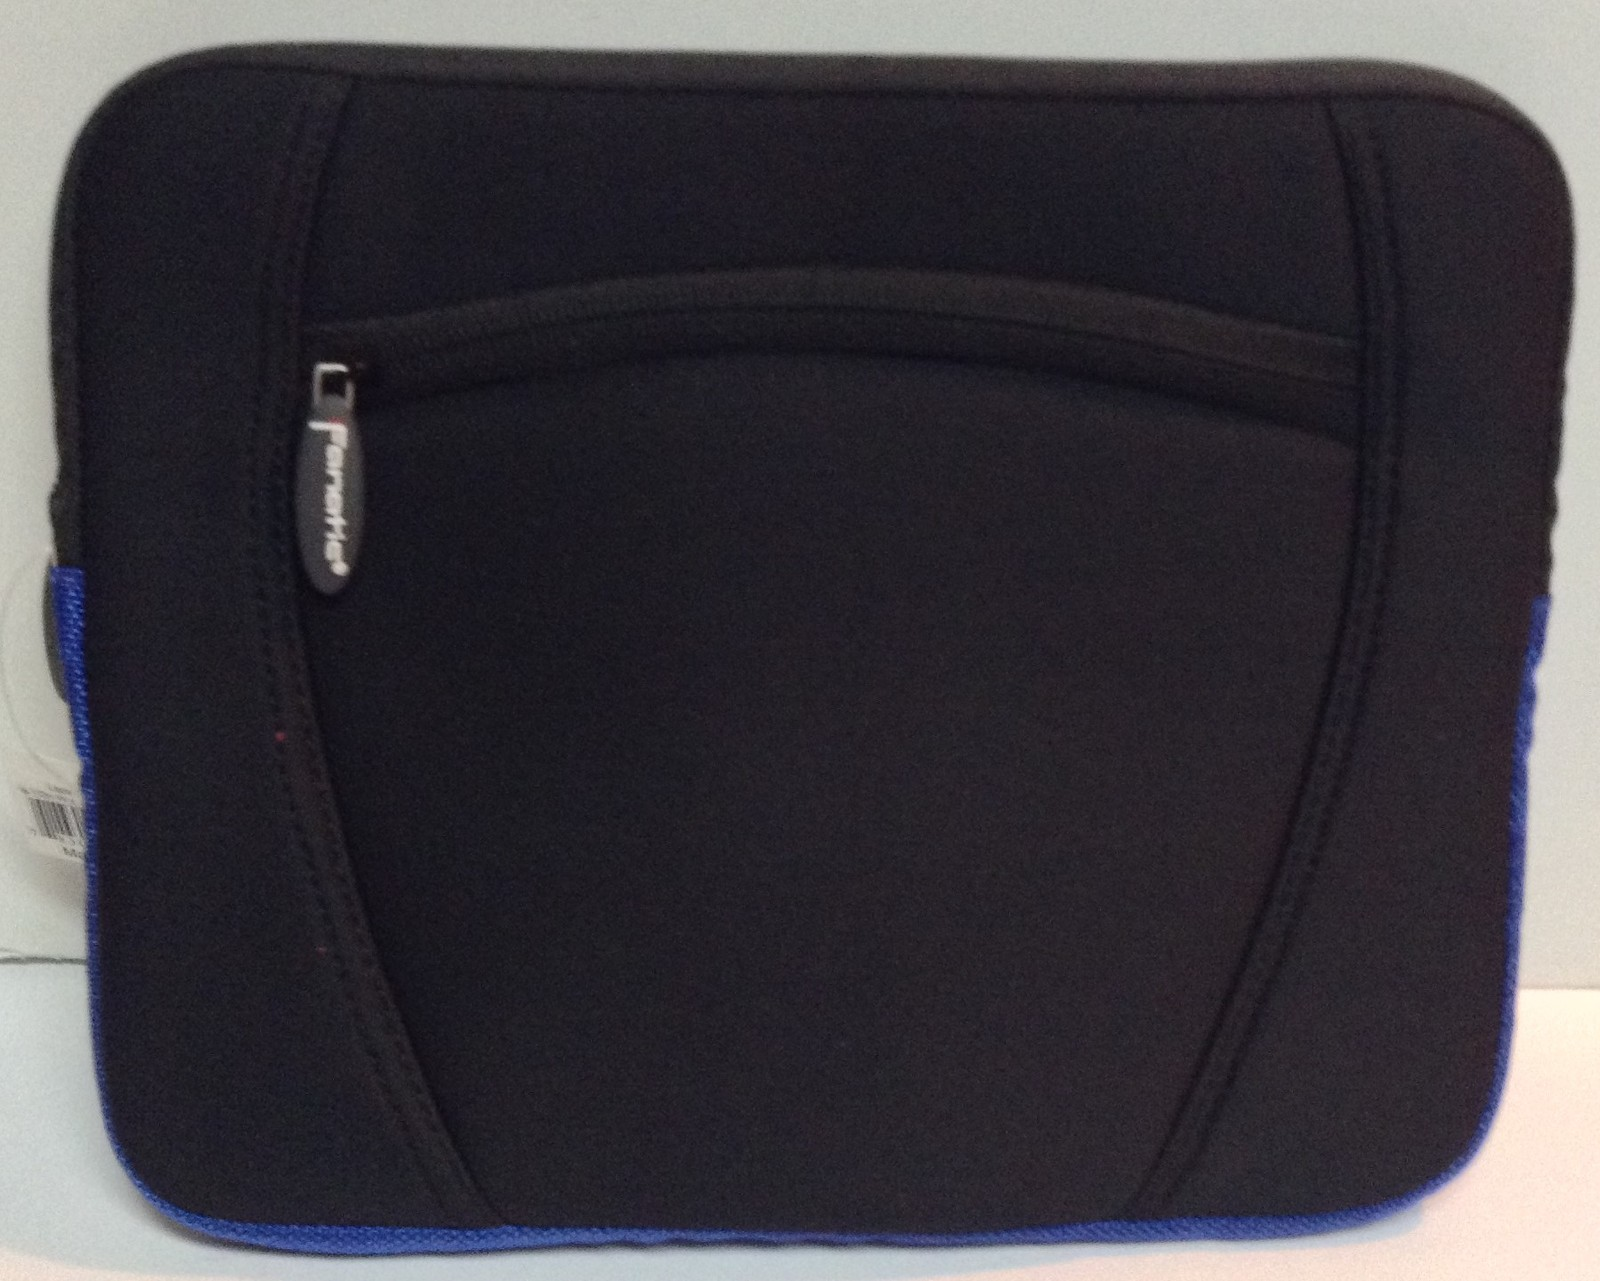 Kansas State University Jayhawks Tablet Ipad Protection Case by Fanatic NWT